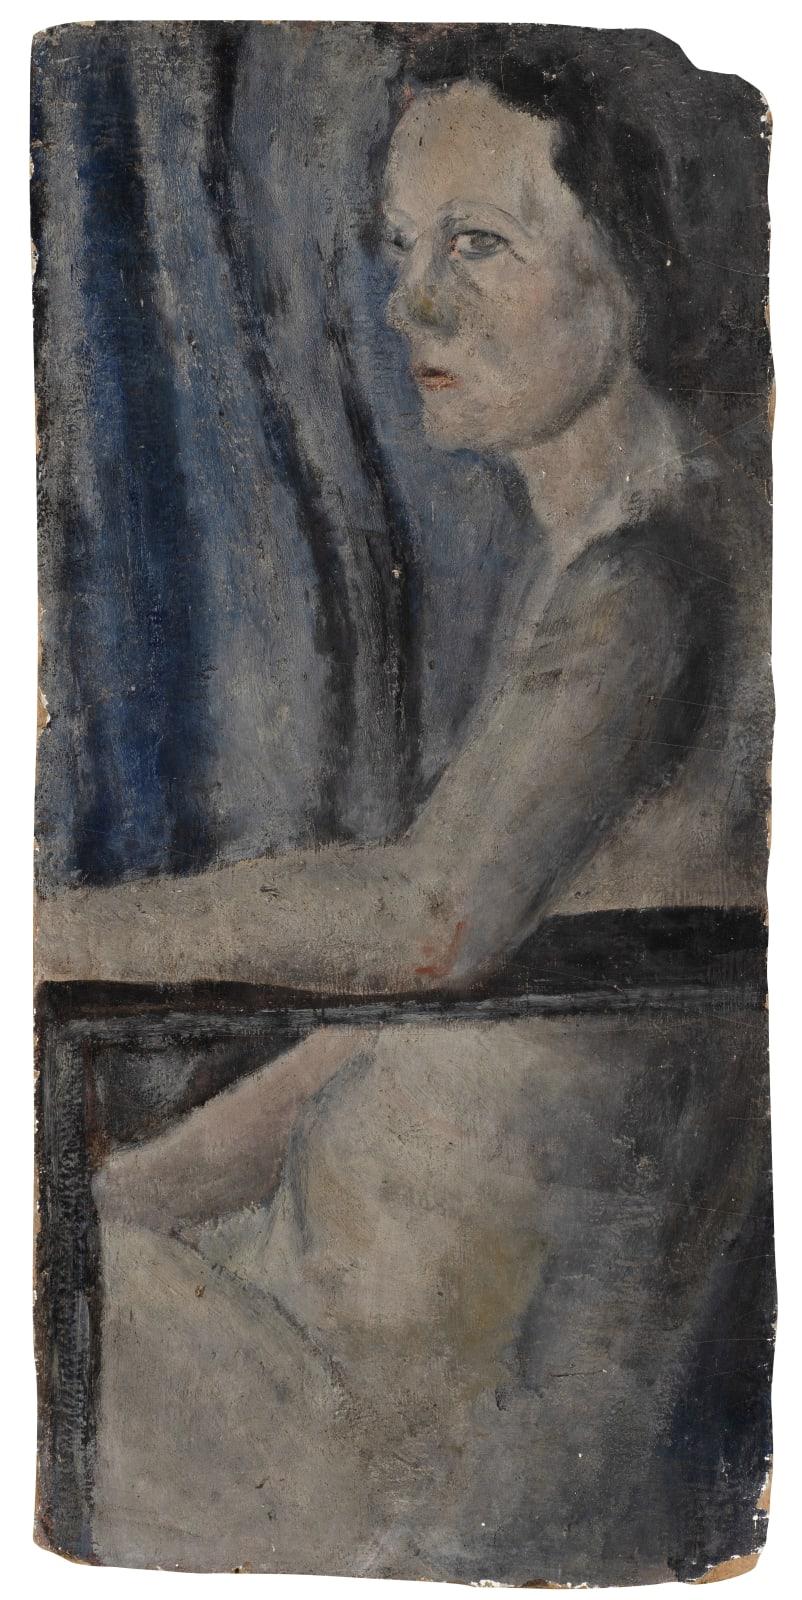 Gustav Metzger Seated Woman, c. 1945-47 Oil on board, 91 x 43cm. The Gustav Metzger Foundation